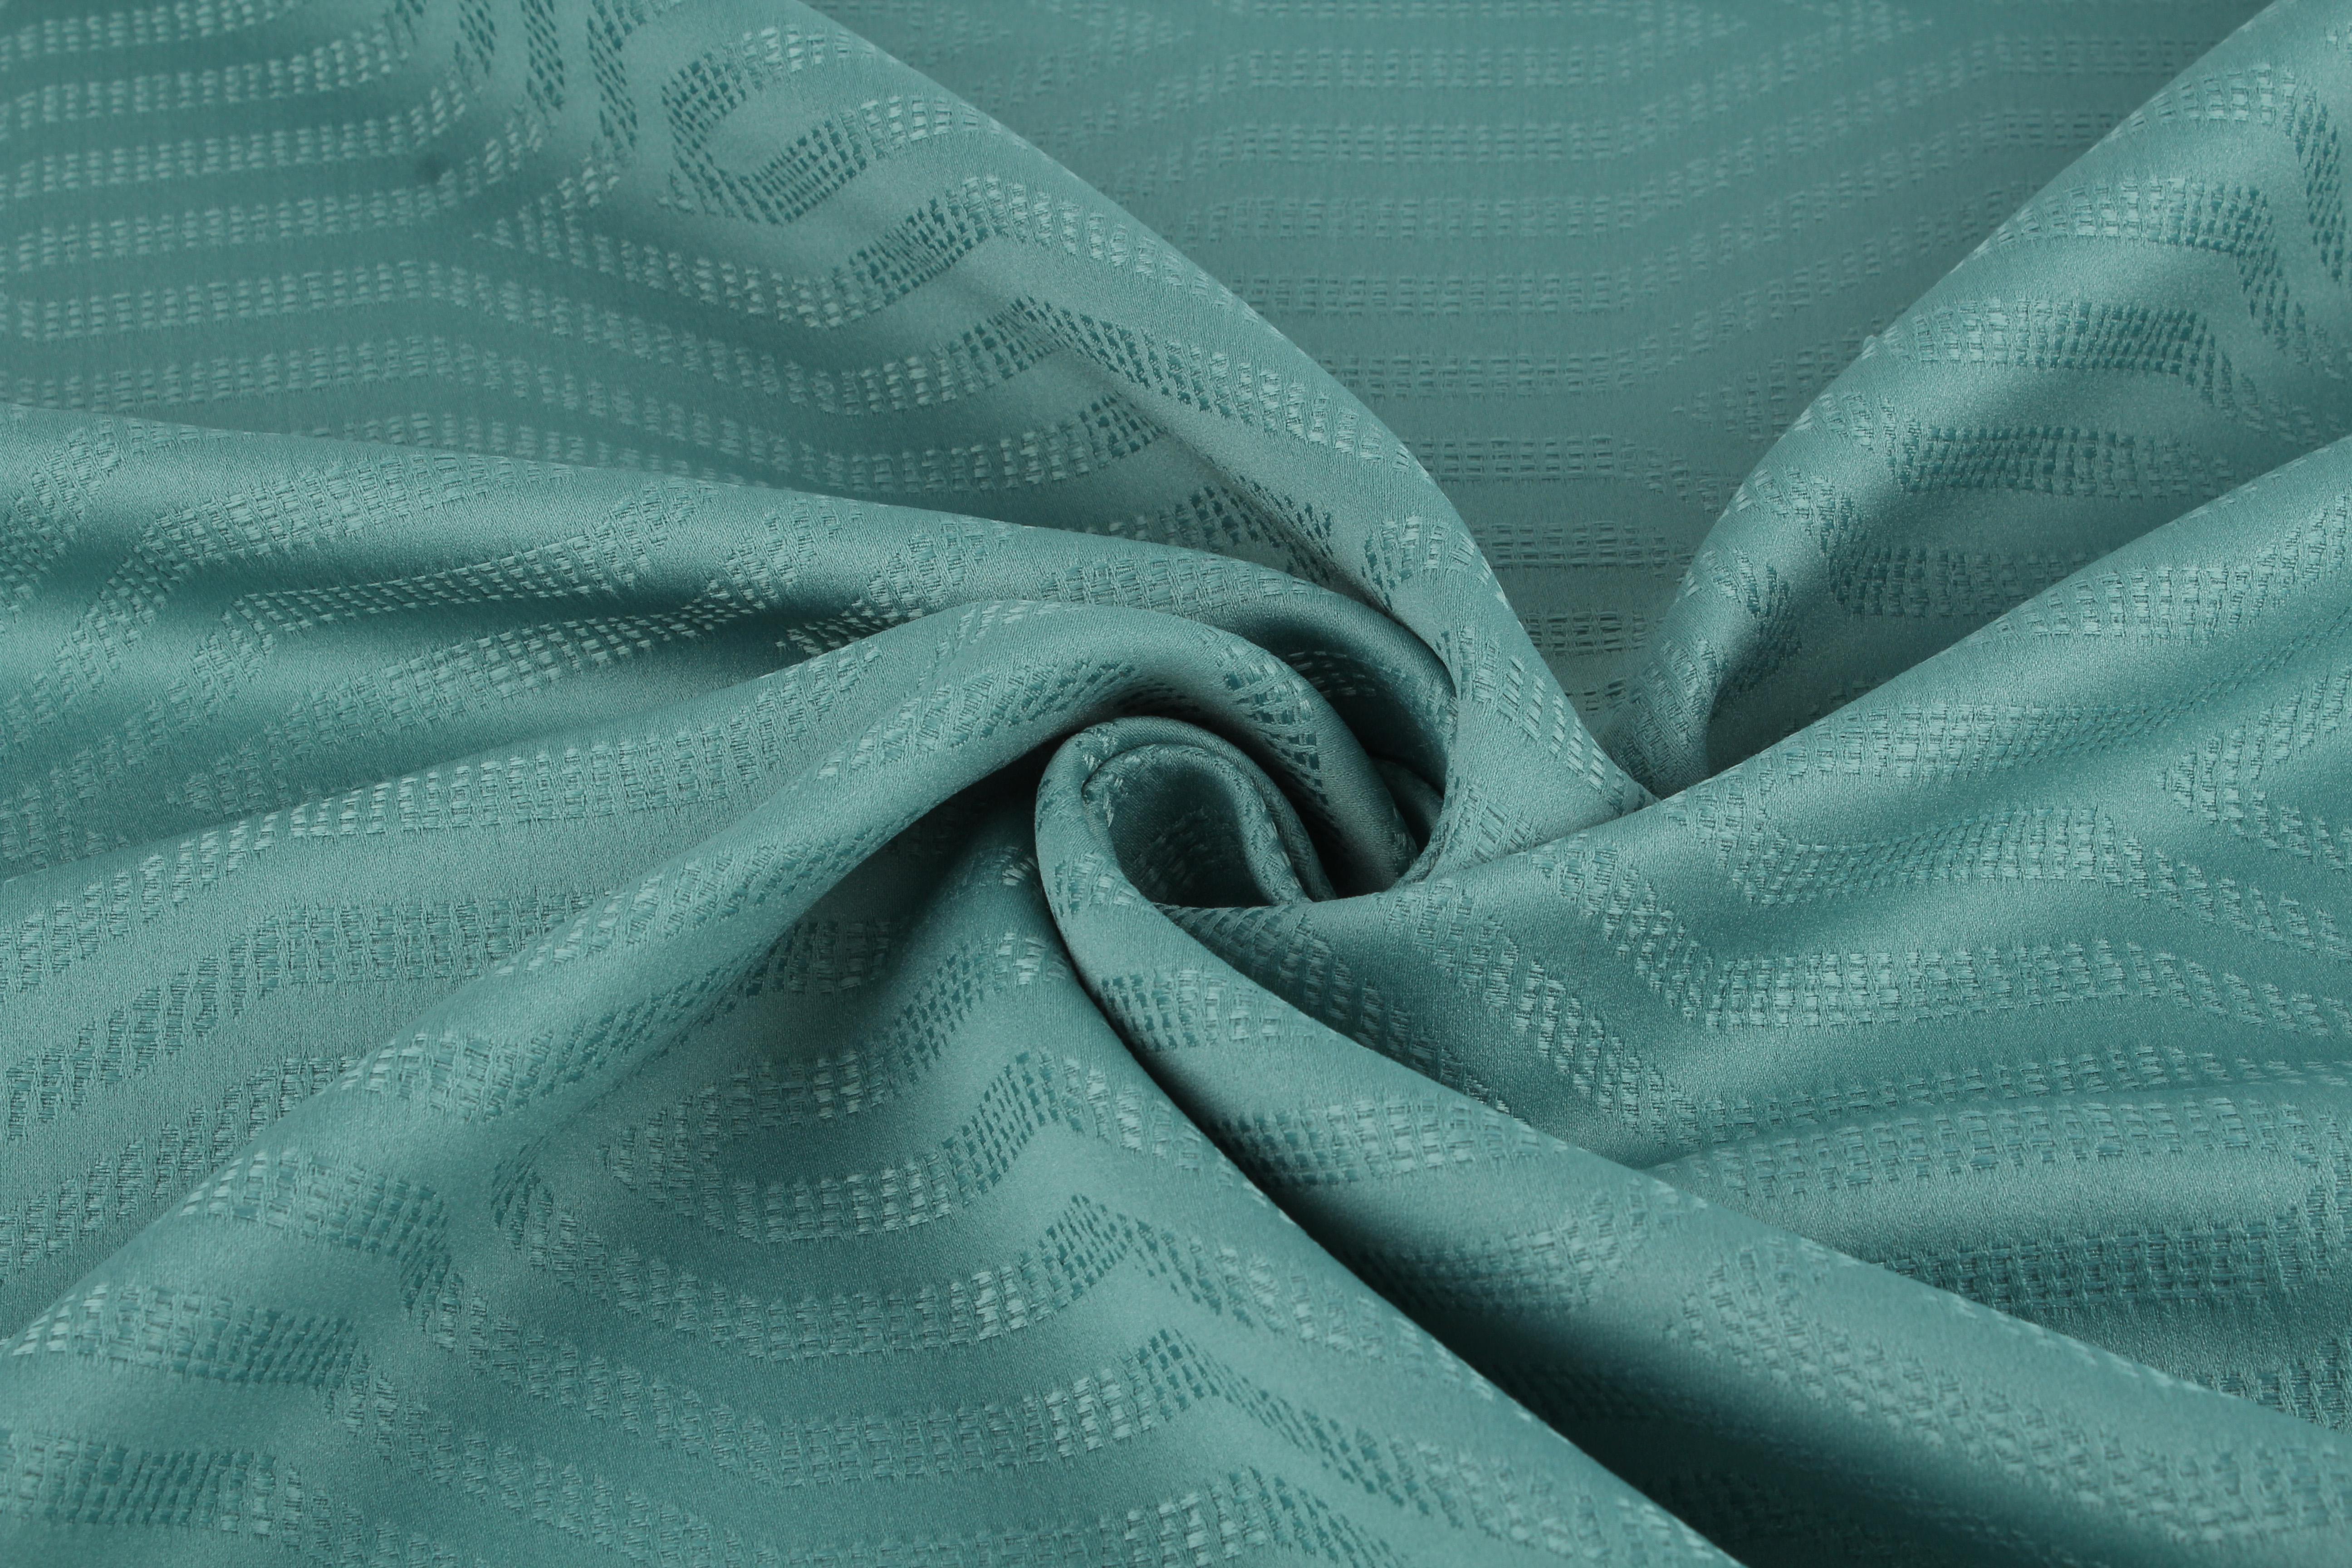 Купить Ткани TexRepublic, Материал Жаккард Lines Цвет: Бирюзовый, Турция, Голубой